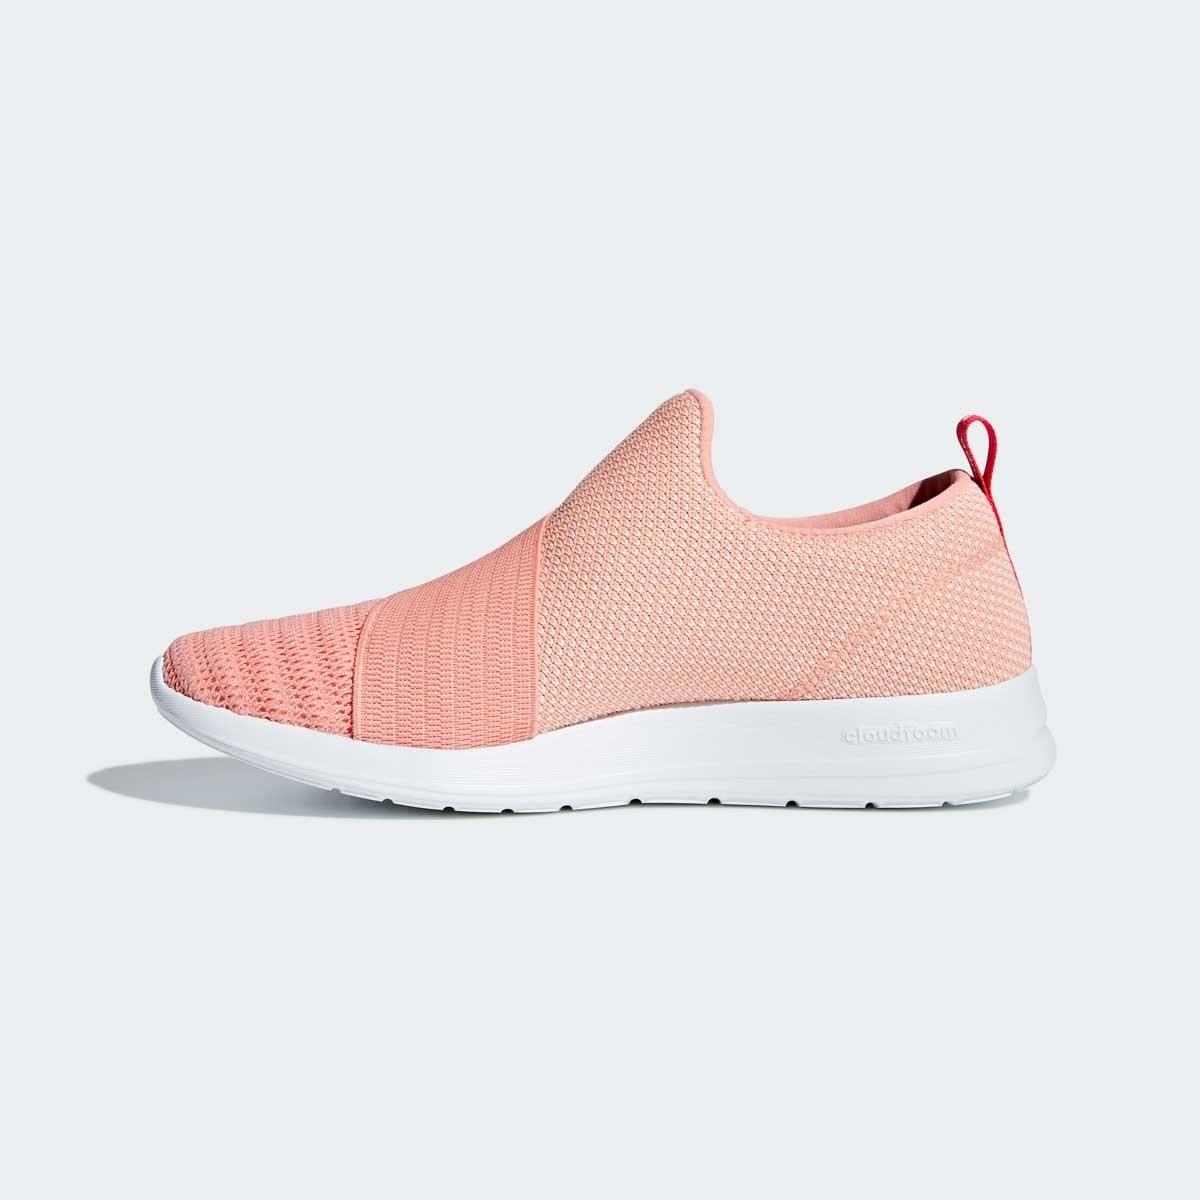 Tenis Running Refine Adapt  Rosa Adidas - Dama